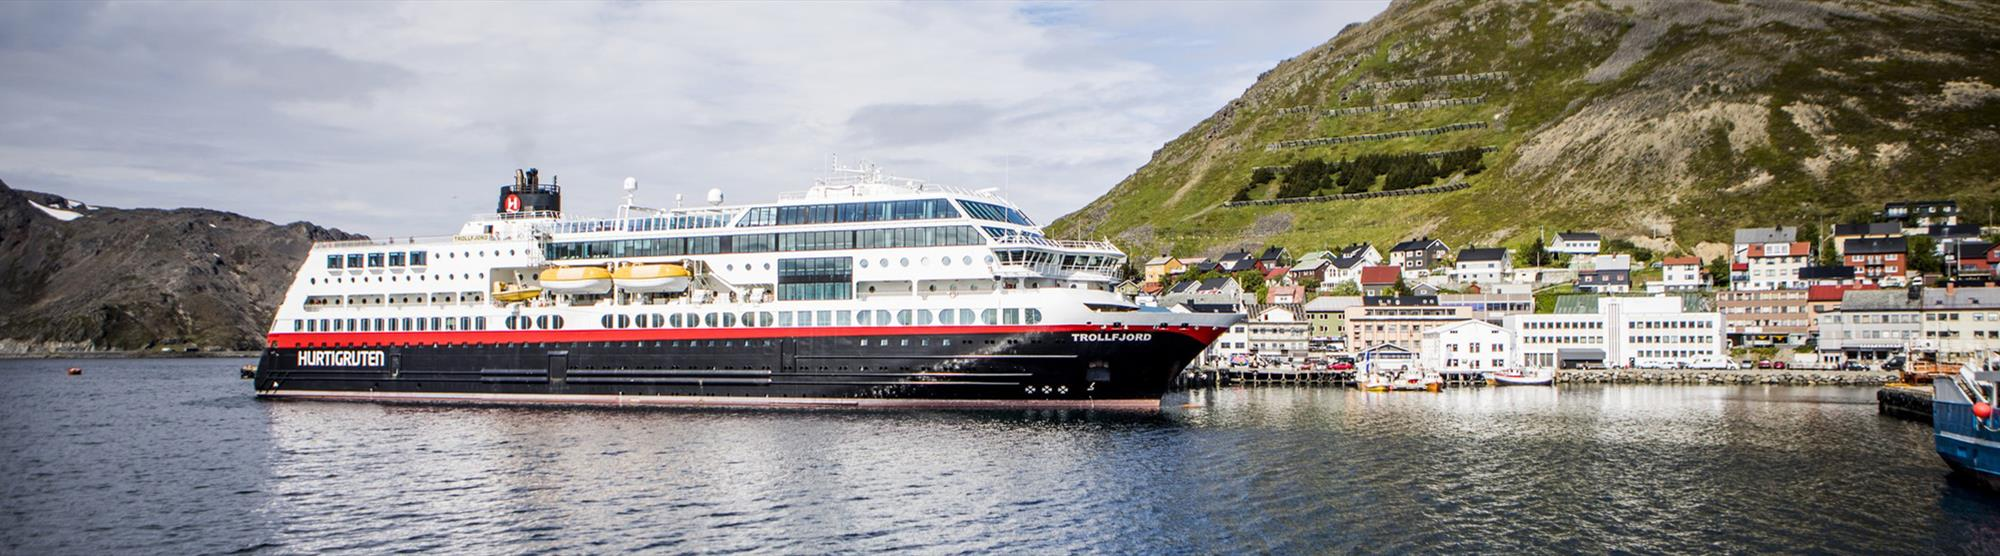 Hurtigruten routes